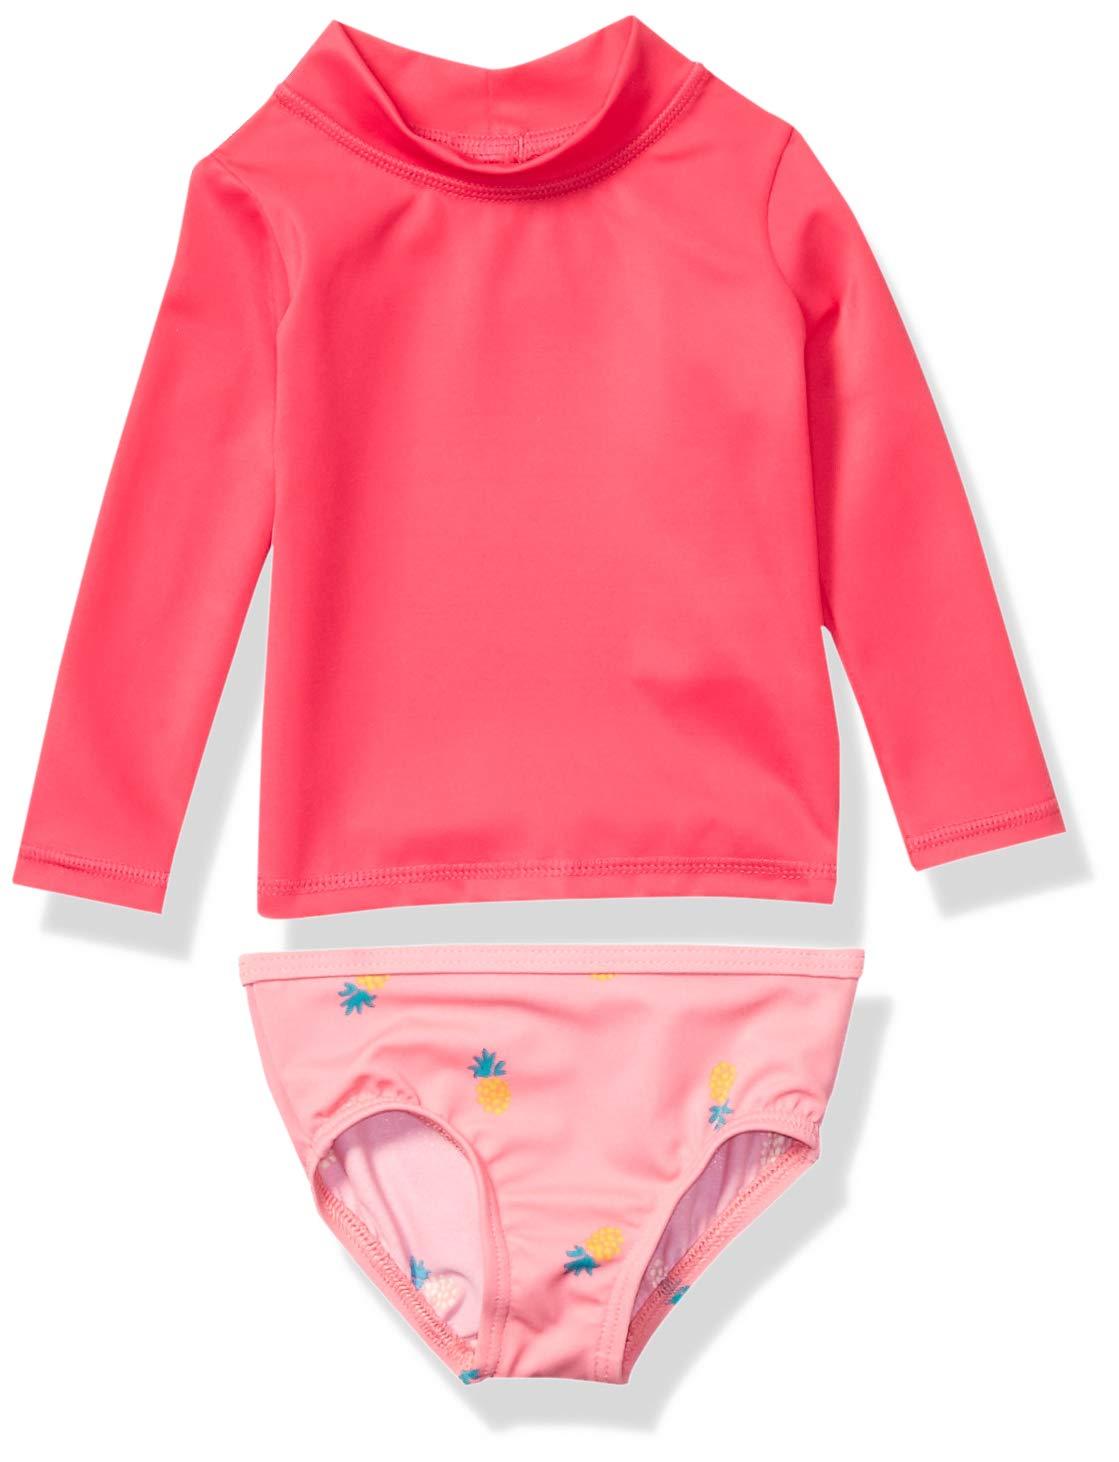 Amazon Essentials UPF 50+ Baby Girls 2-Piece Long-Sleeve Rash Guard Set